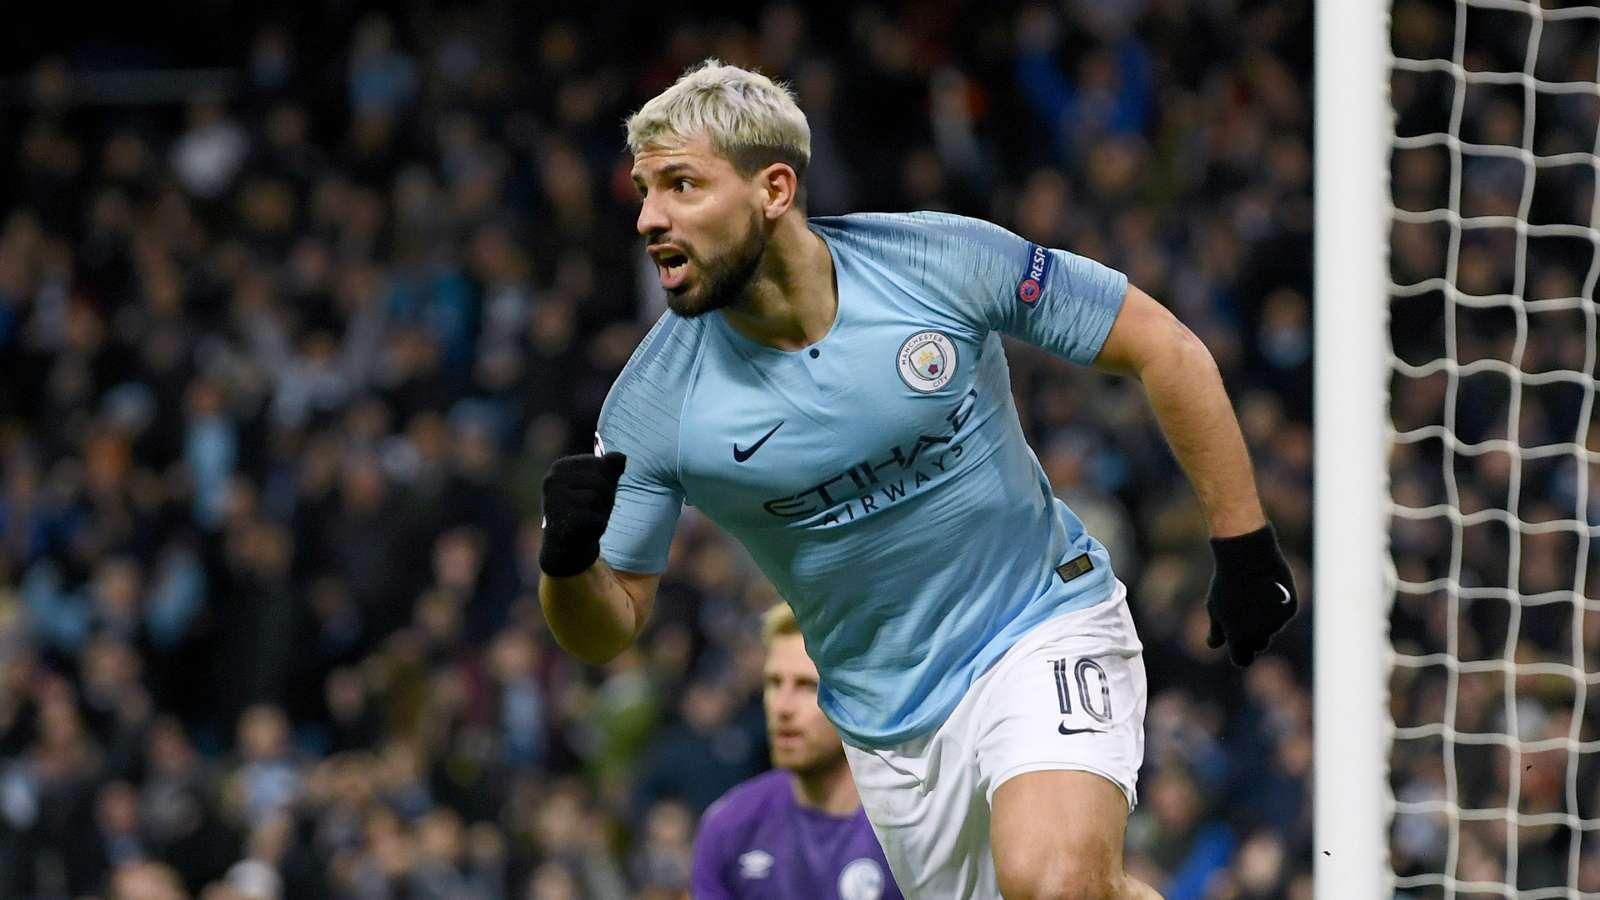 sergio aguero cropped 4n4uwjejh3041dowlw6enbzei - Manchester City vs Schalke 7-0: UEFA Champions League Match Report & Highlights [Video]